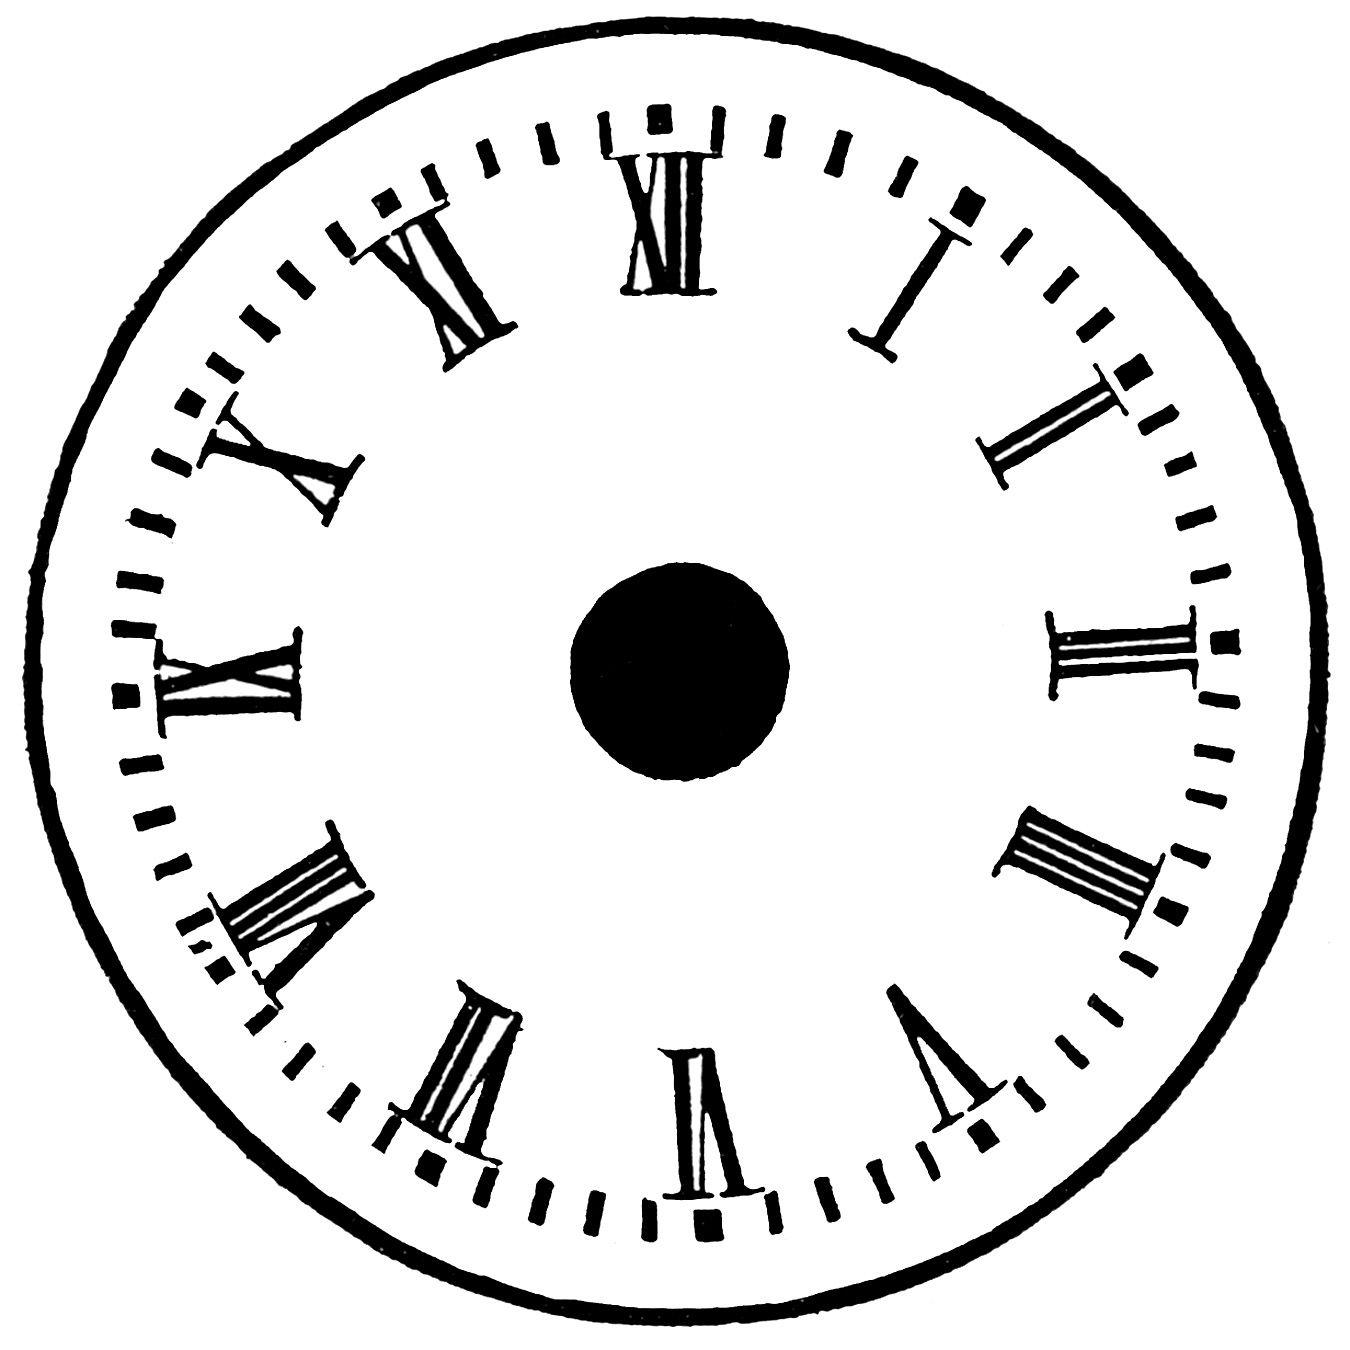 vintage clip art french clock parts craft ideas pinterest rh pinterest com clock face clipart 1 o'clock clock face clip art free